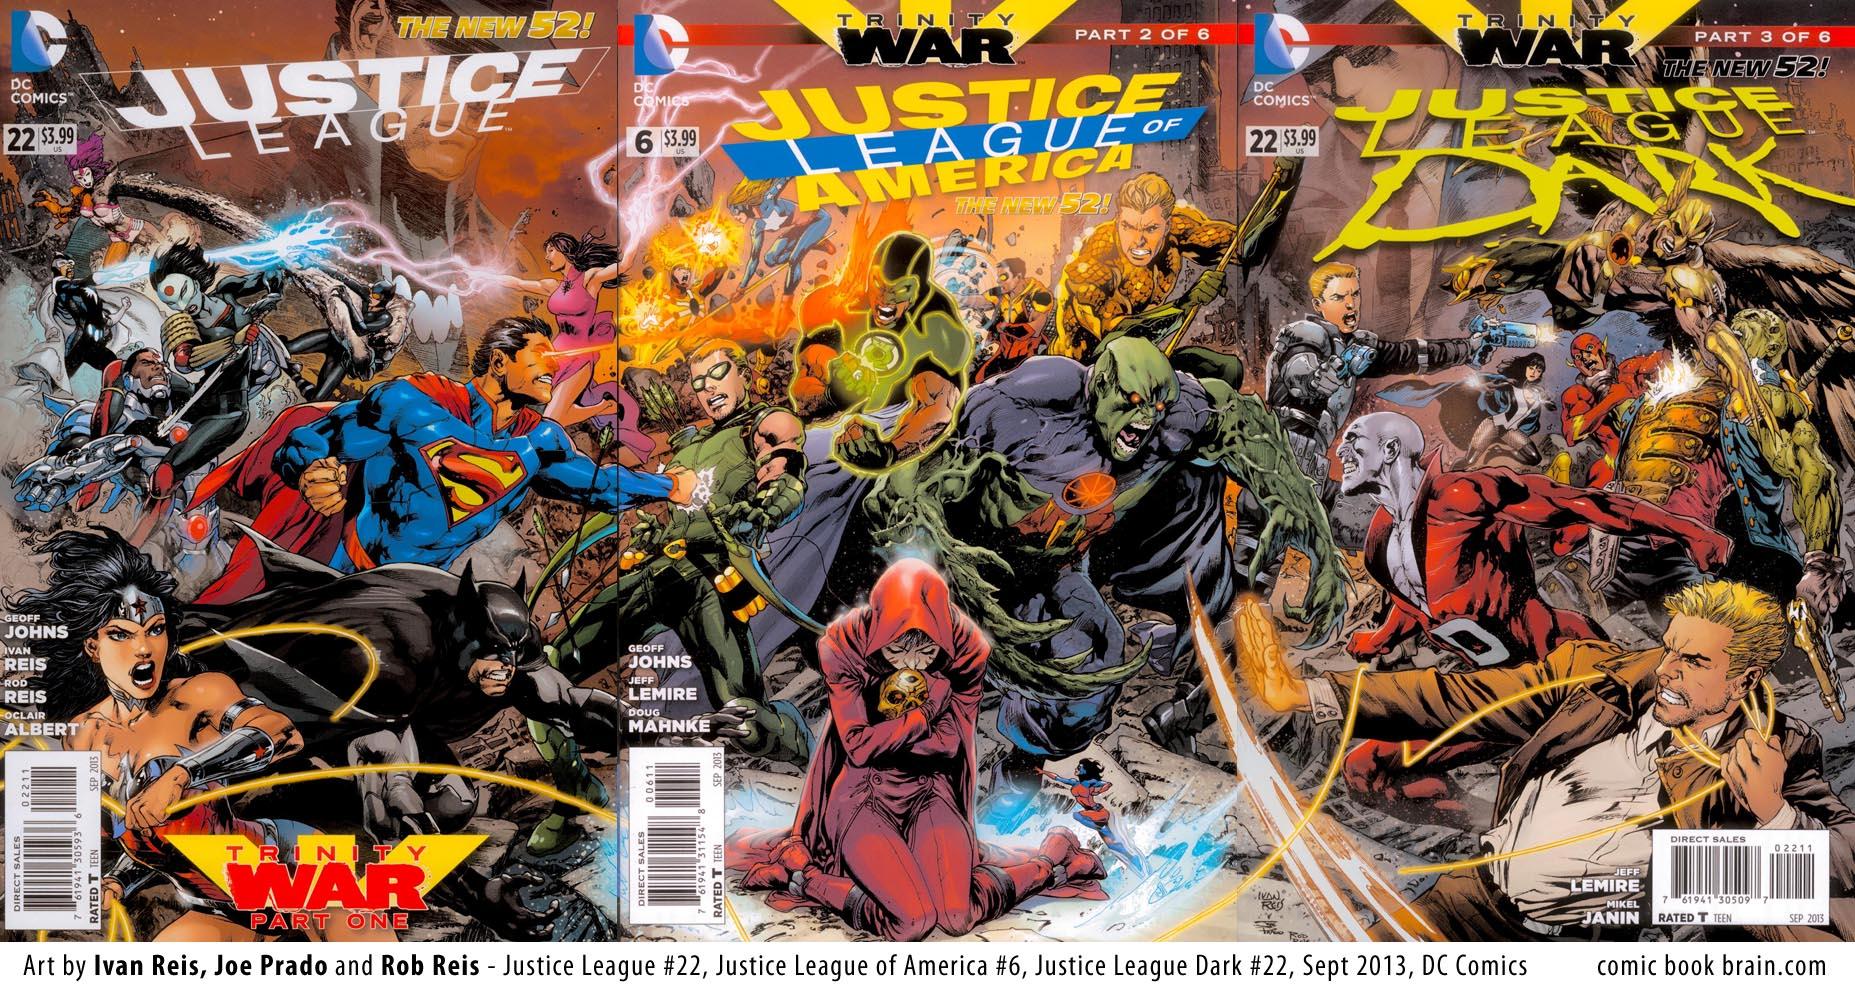 Trinity War Wallpapers Comics Hq Trinity War Pictures 4k